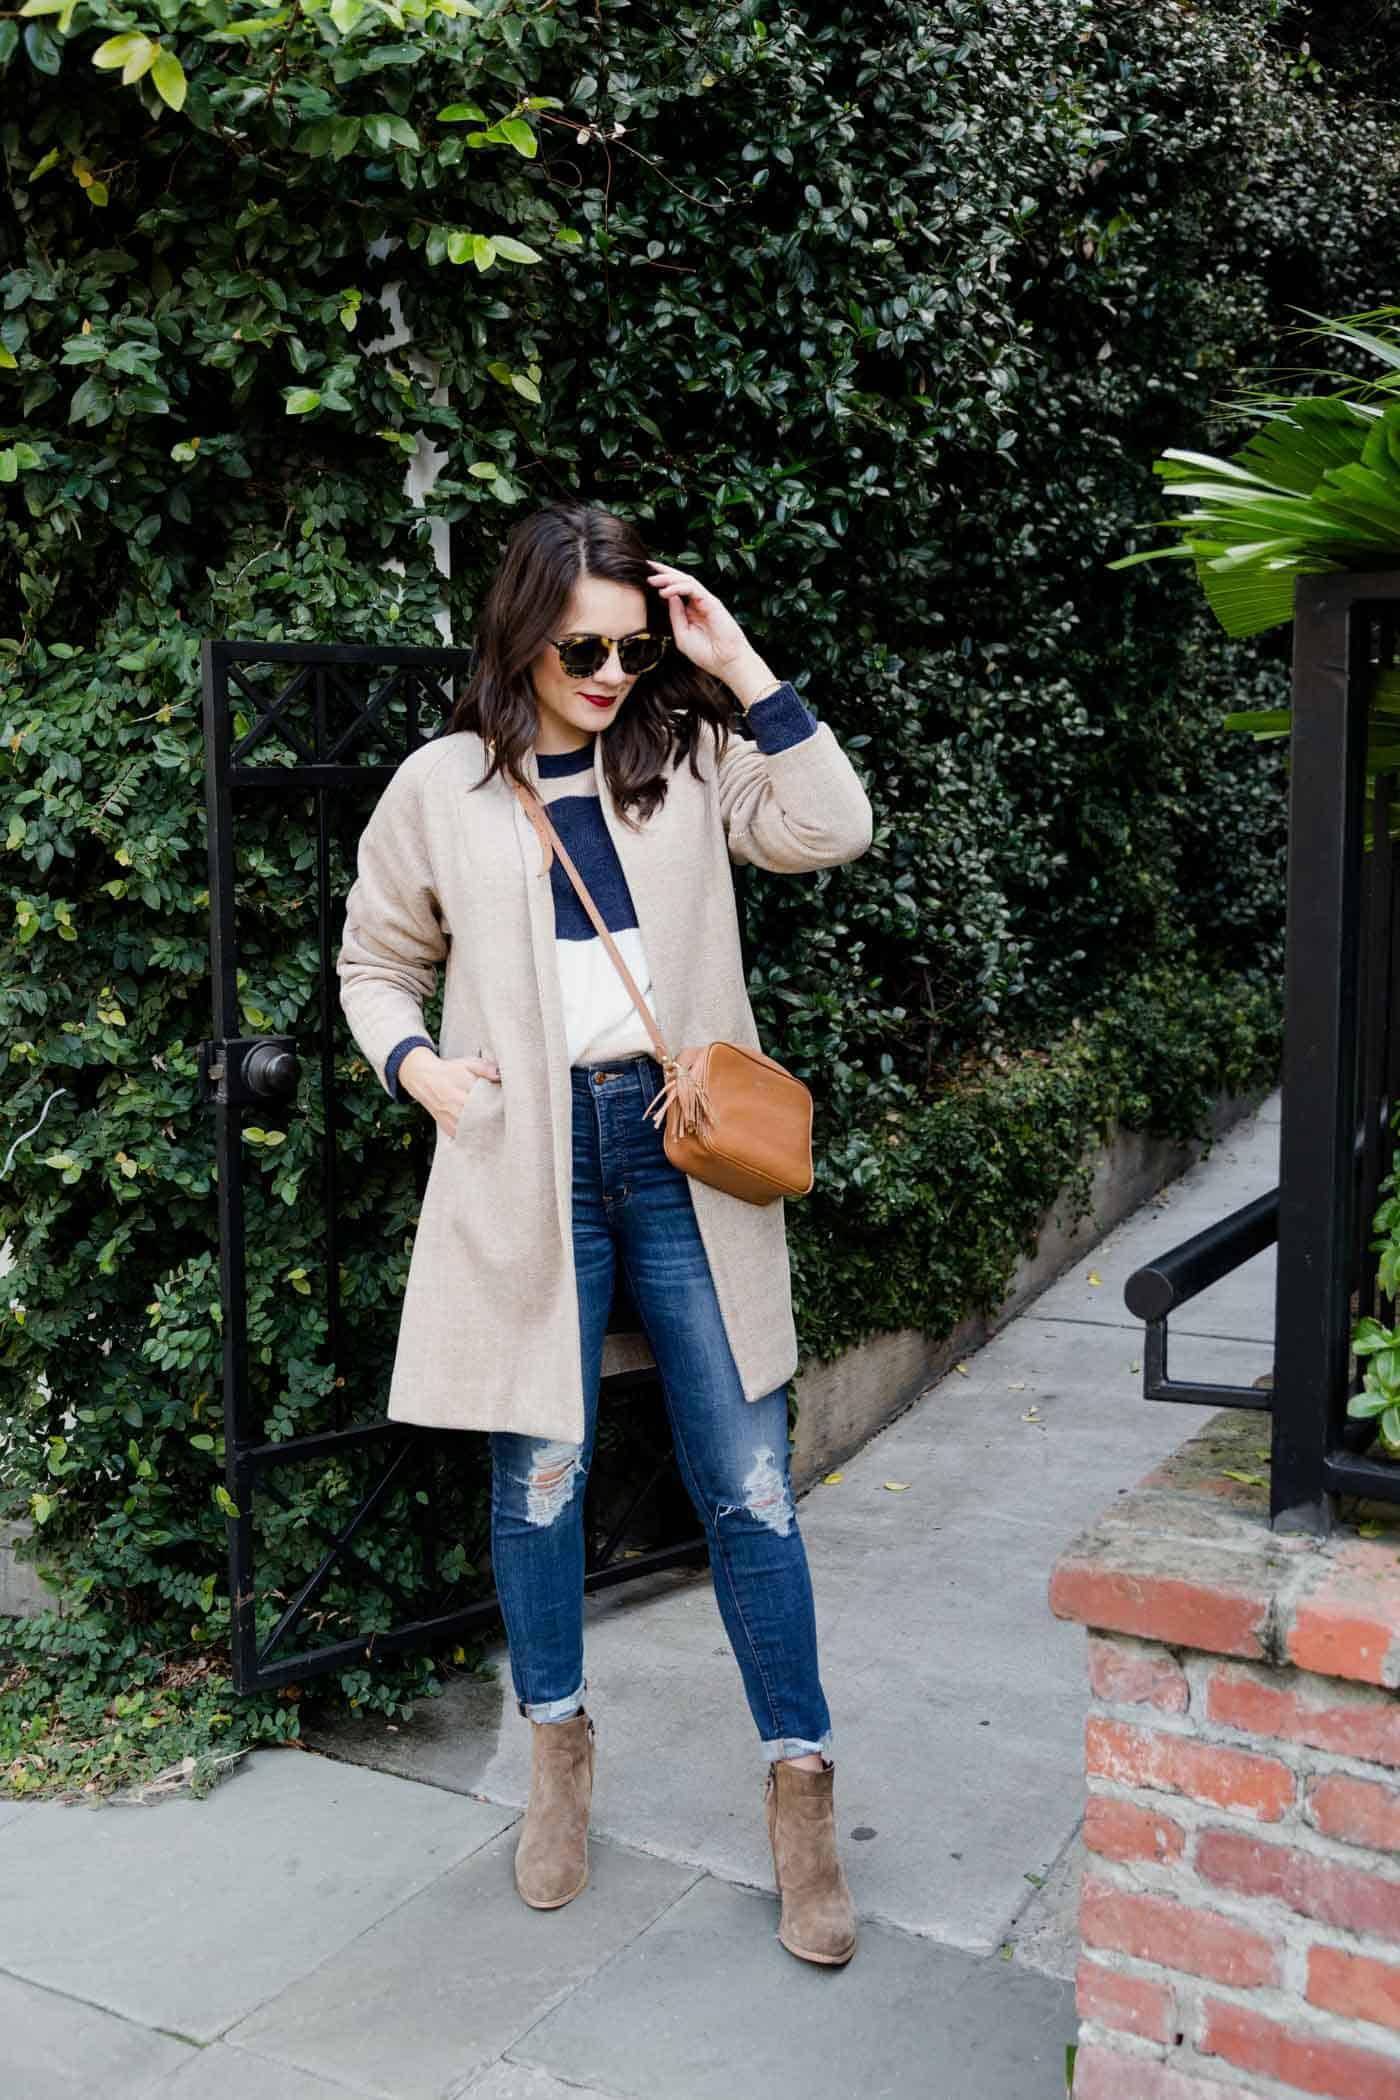 lightweight coats for spring, Madewell Stanza coat - My Style Vita @mystylevita